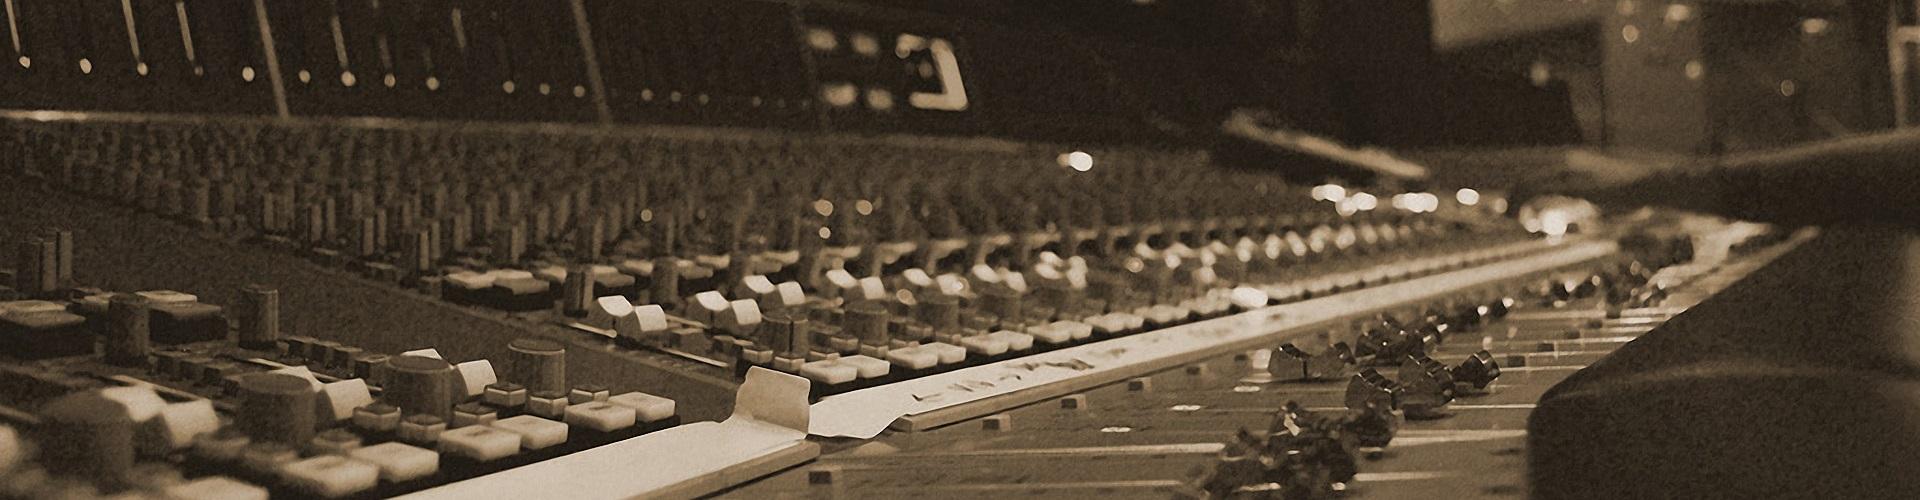 mixing_1920x500